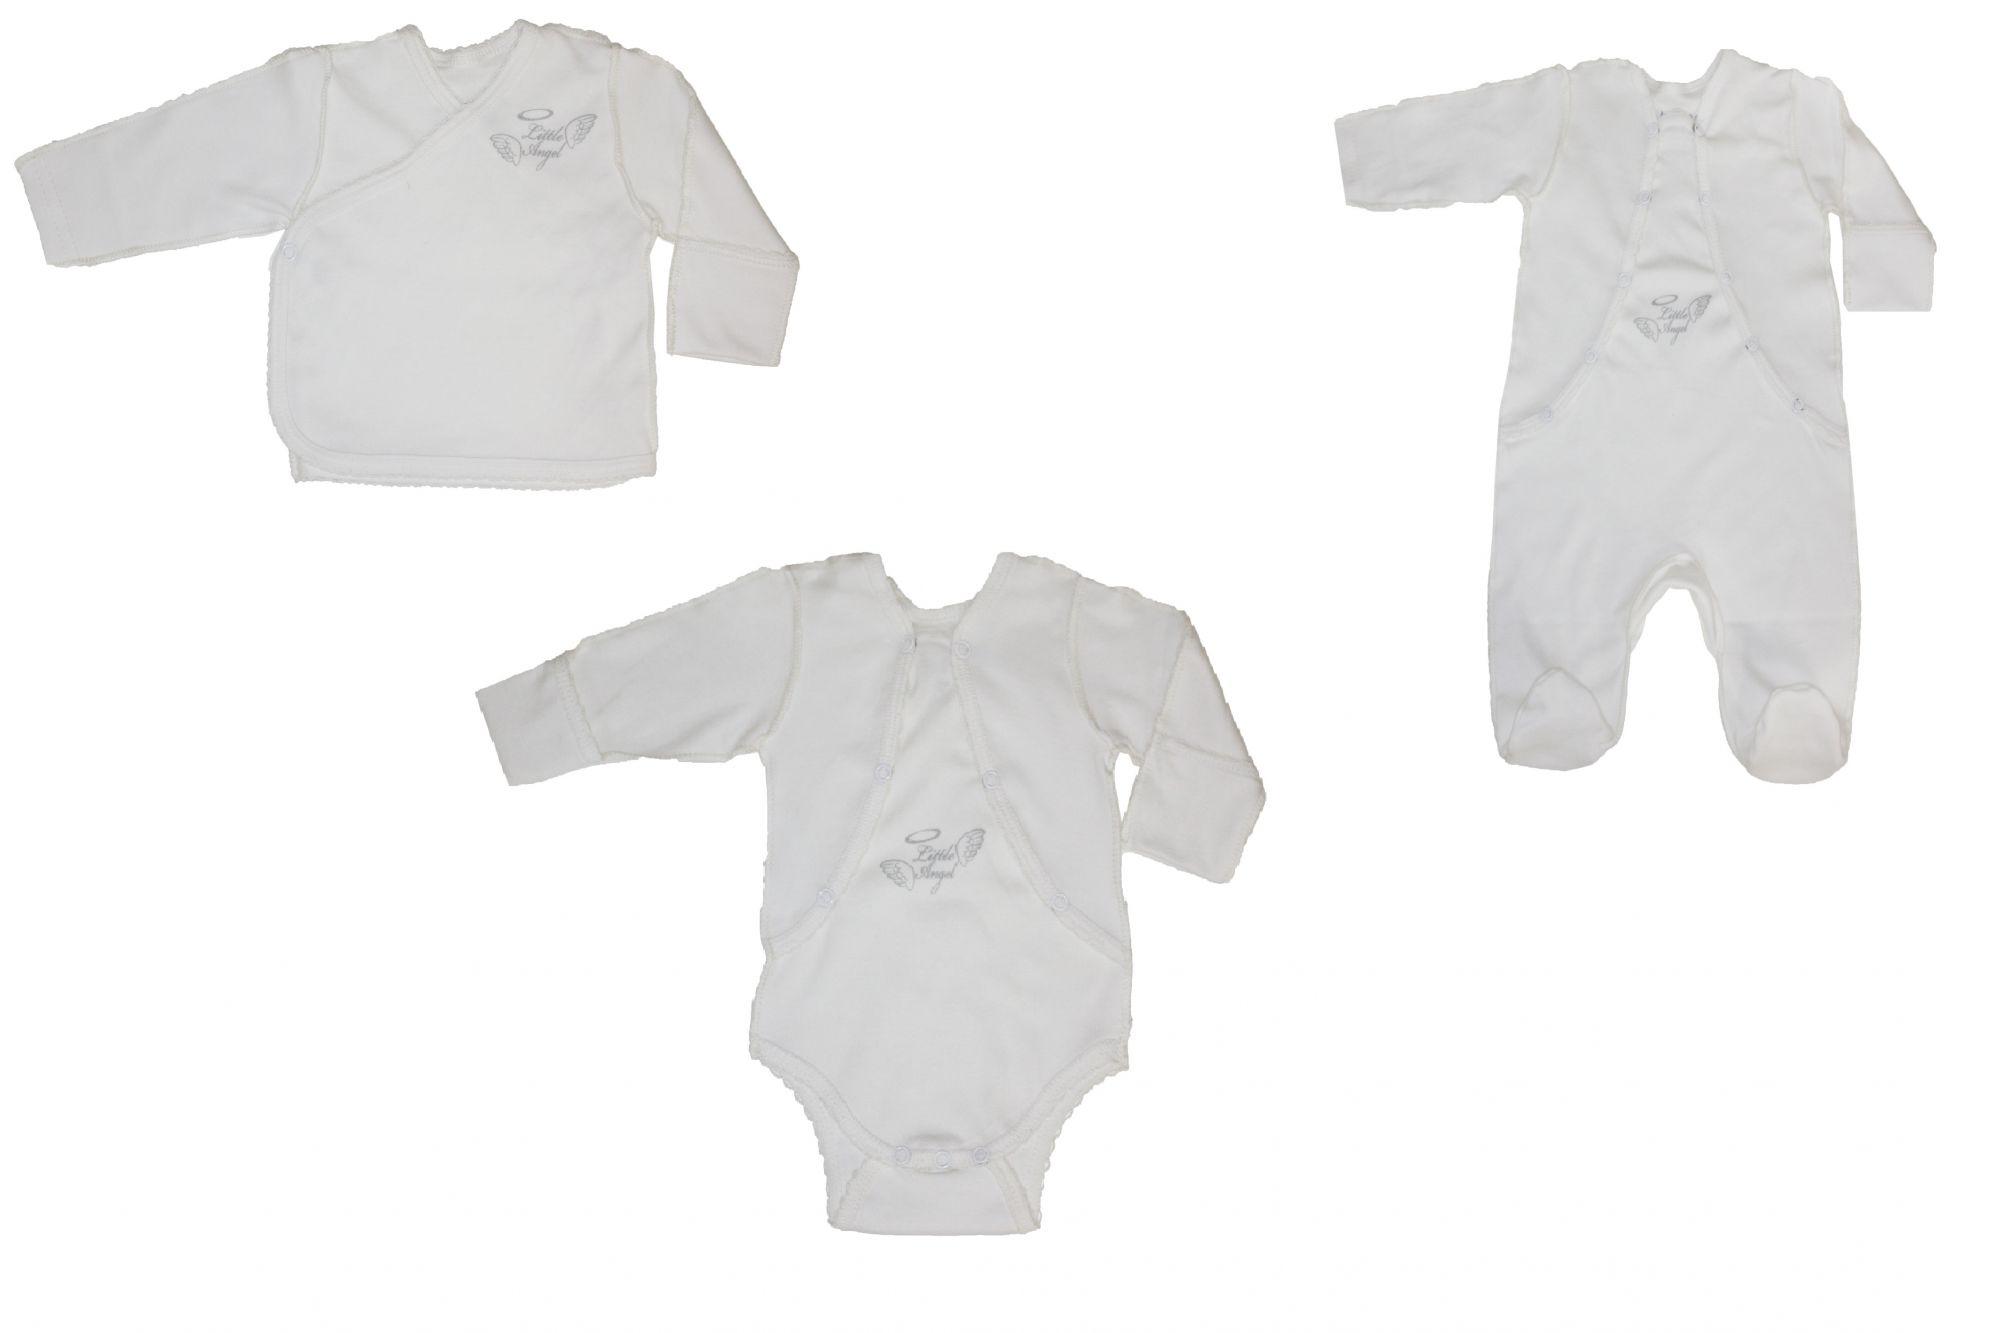 42123 Комплект 3 предмета «Маленький ангел» (интерок)